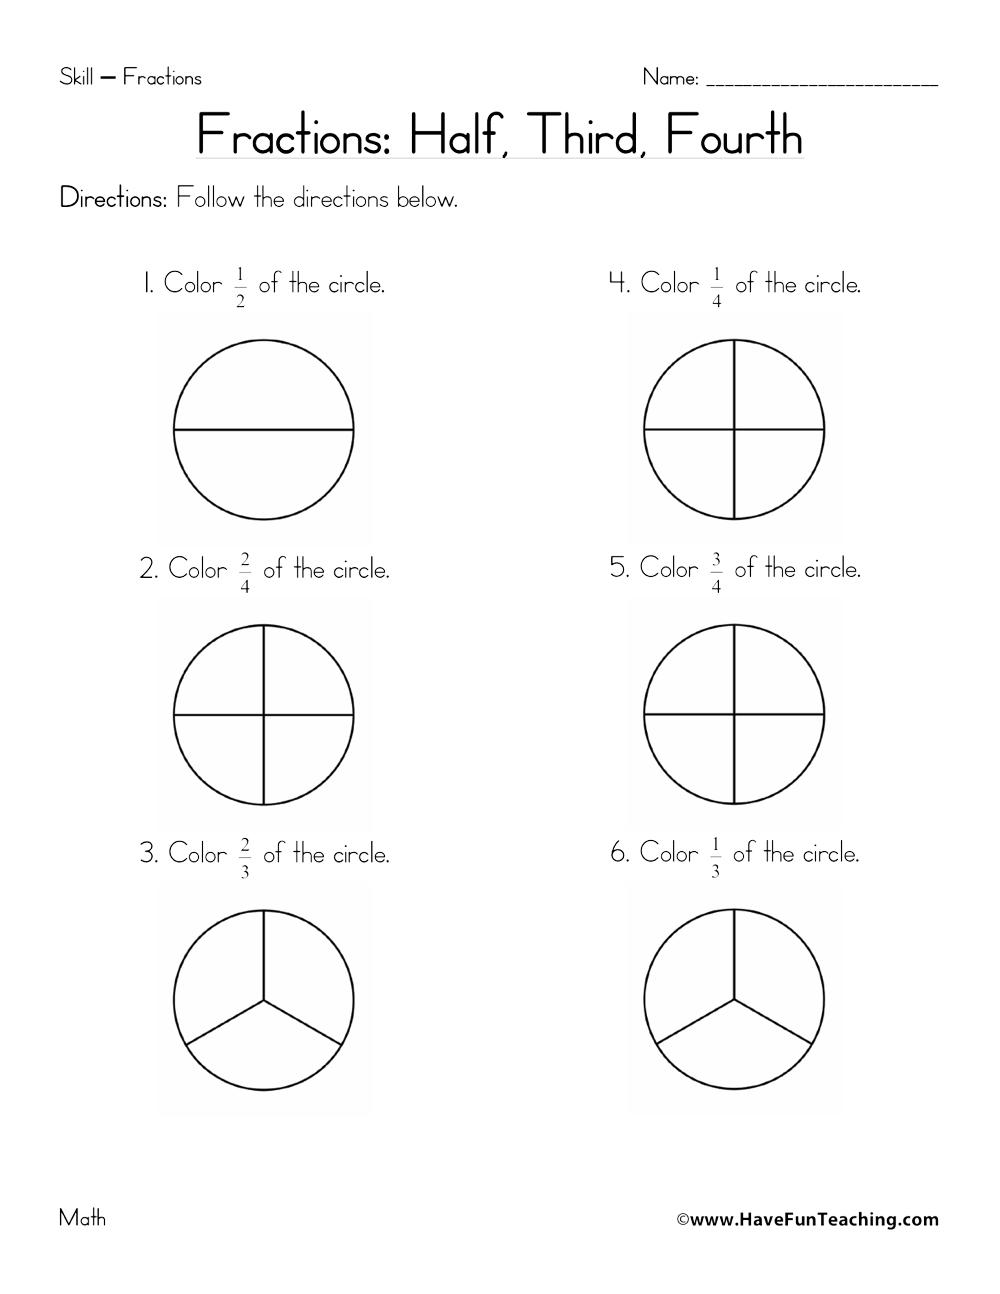 Fractions Worksheet - Halves, Thirds, Fourths - Have Fun ...